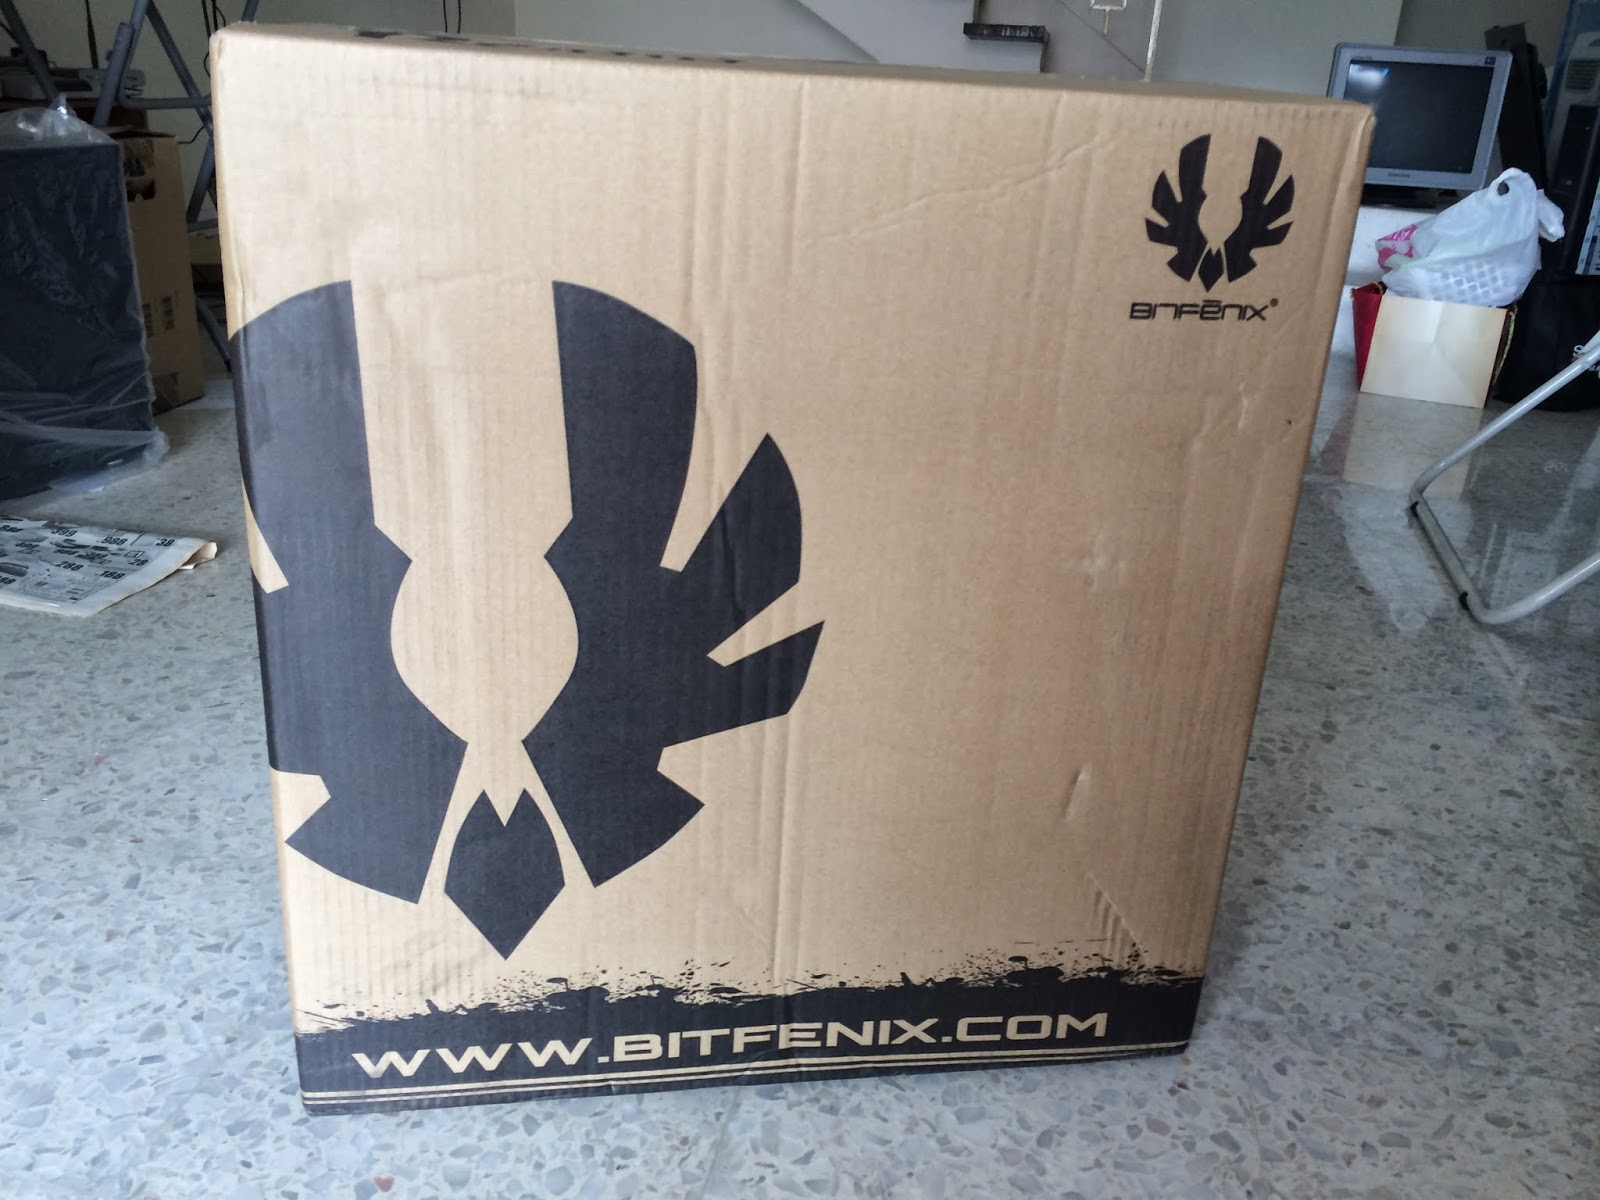 Unboxing & Review: Bitfenix Ronin 102